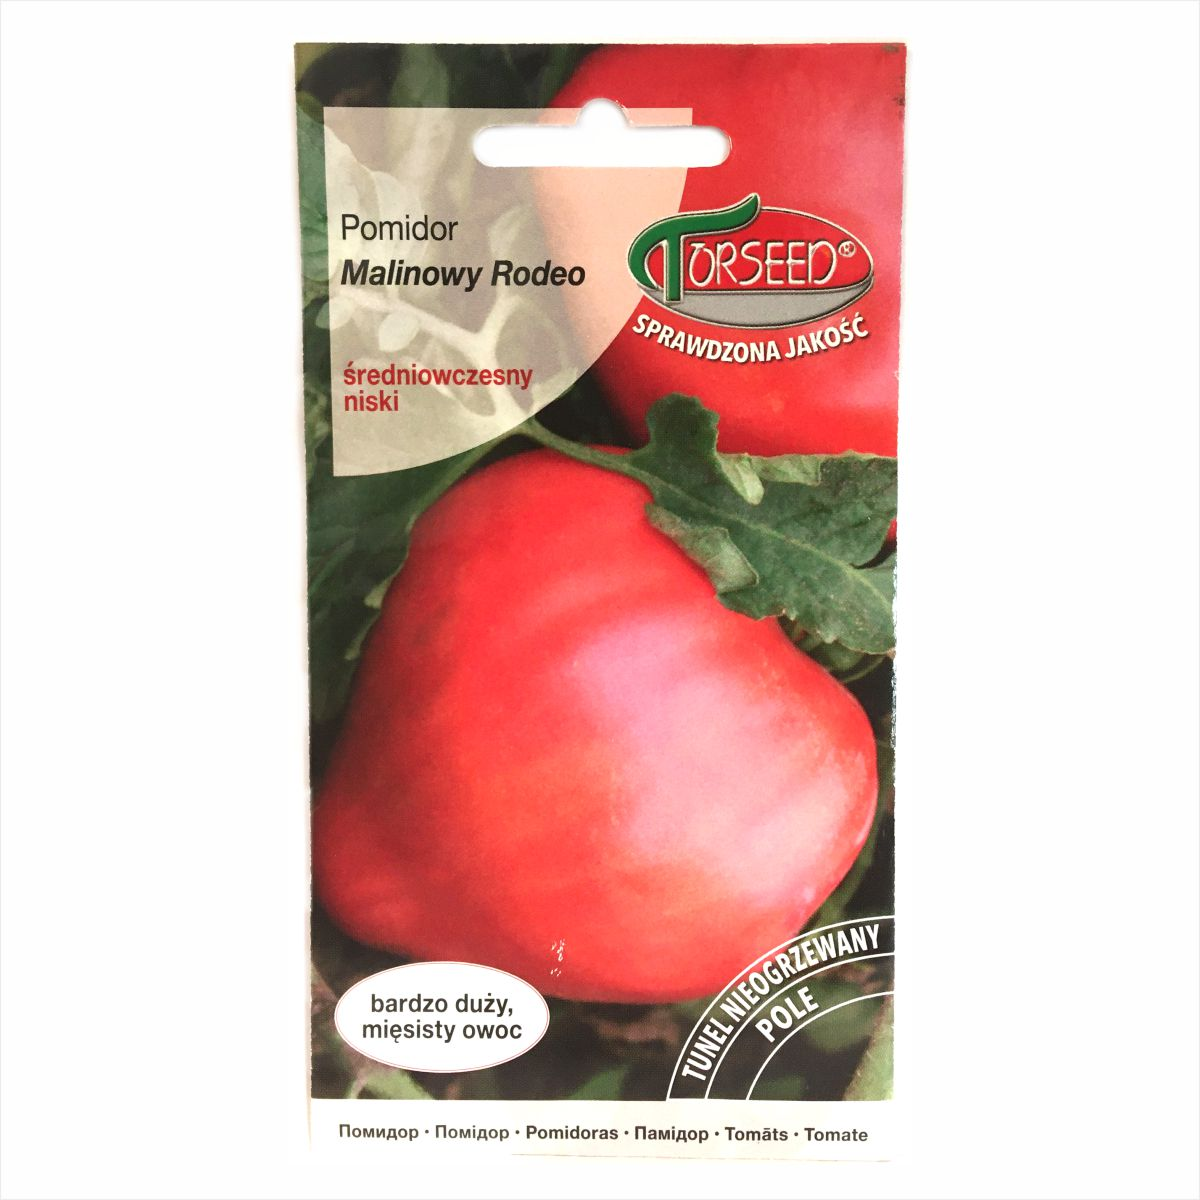 Pomidor Malinowy Rodeo nasiona Torseed